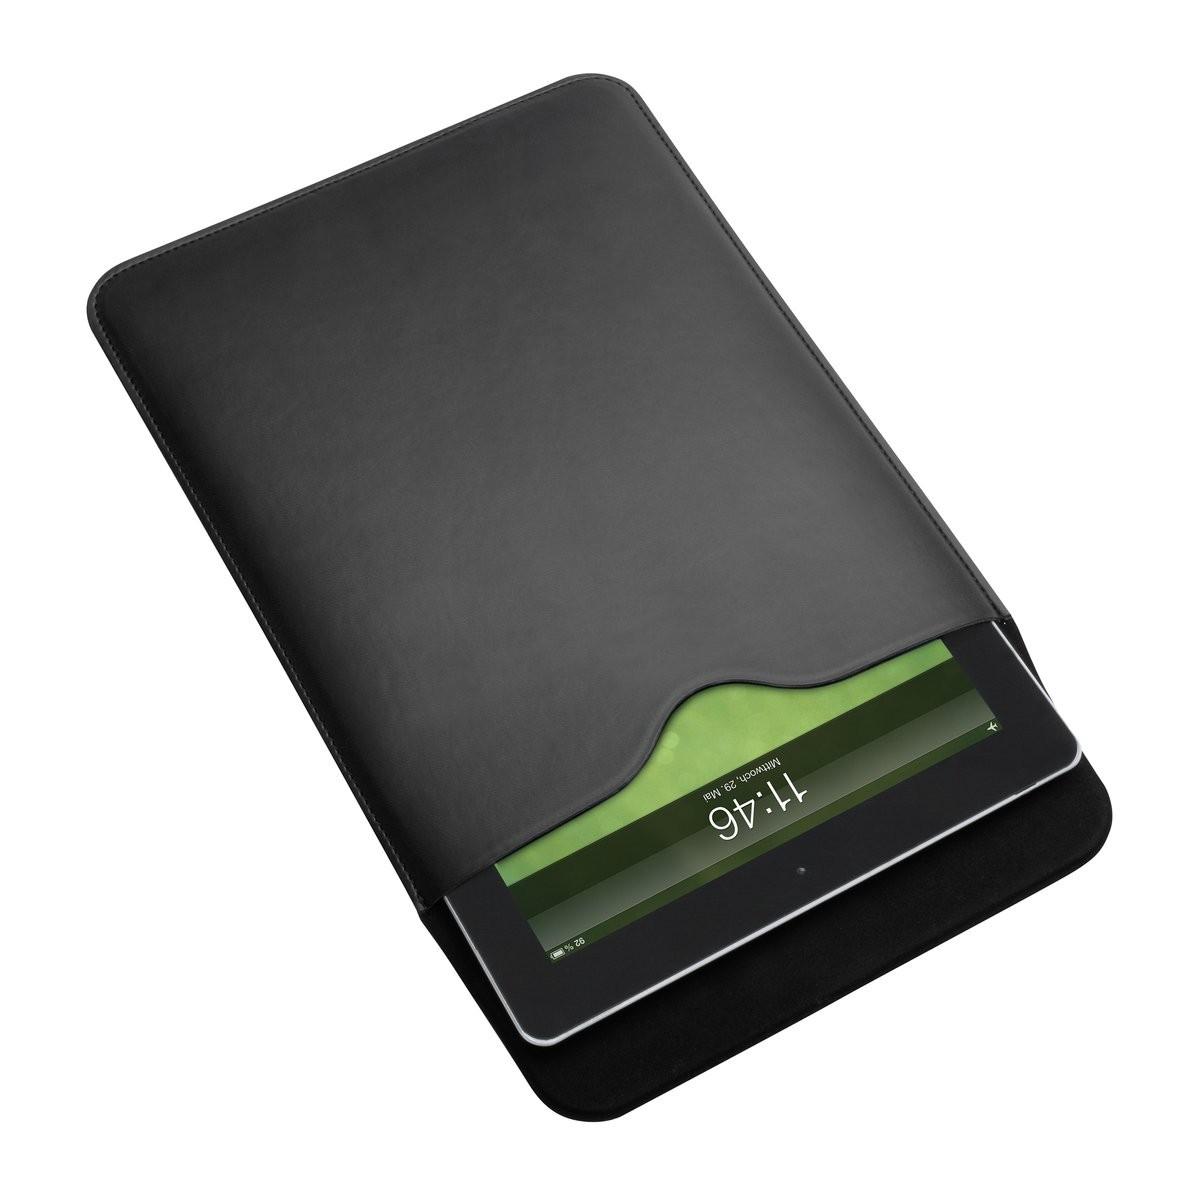 Tabletcomputertasche REFLECTS-LONINT BLACK, Ansicht 2